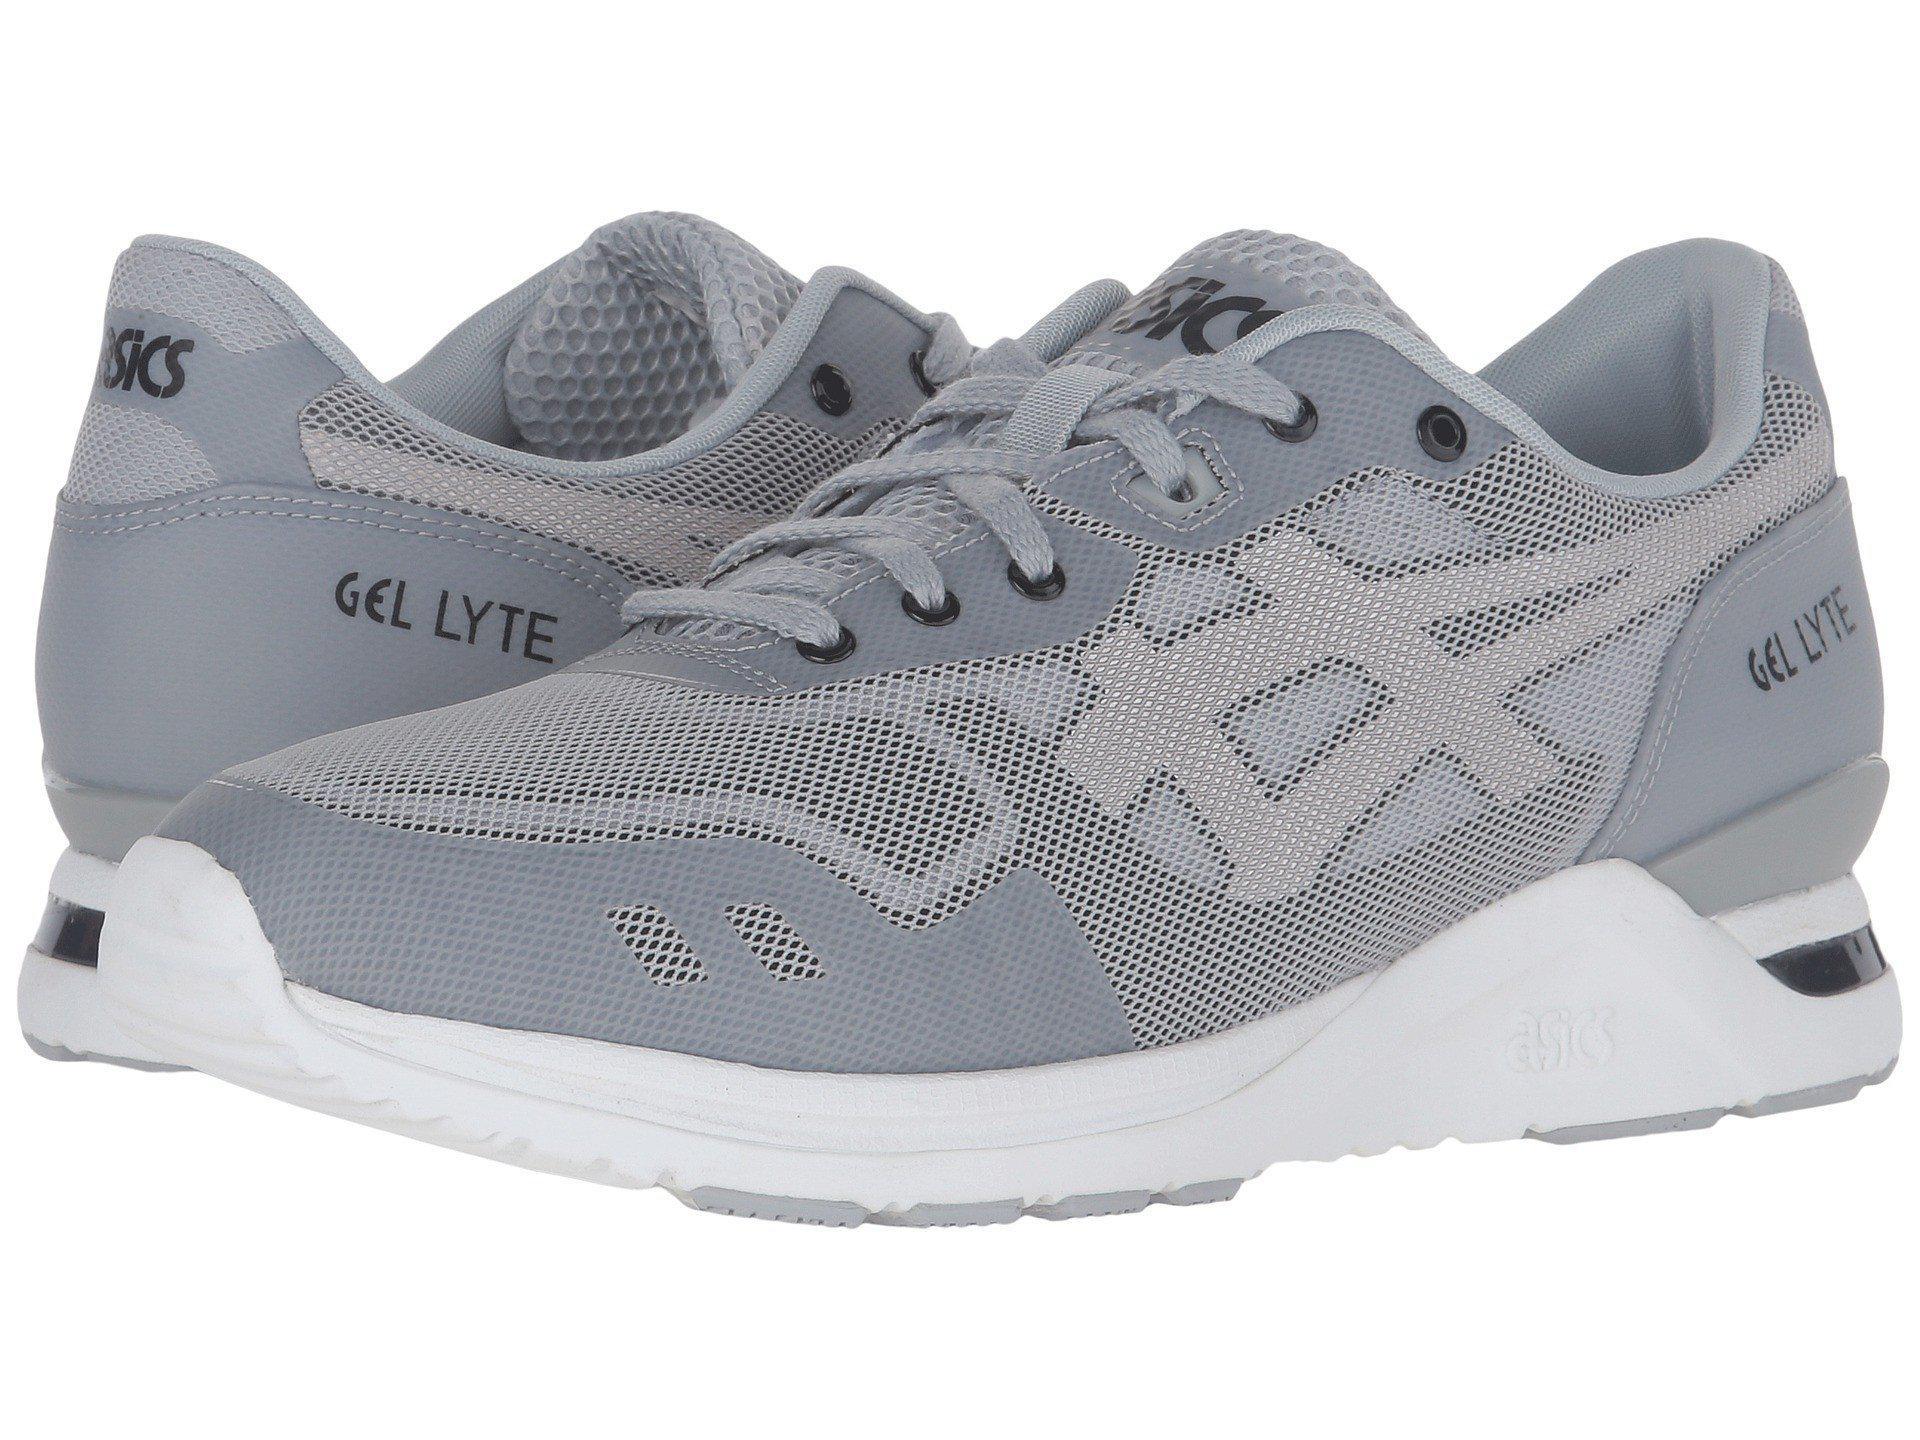 quality design 4ff4a 9653f Lyst - Asics Gel-lyte Evo Nt in Gray for Men